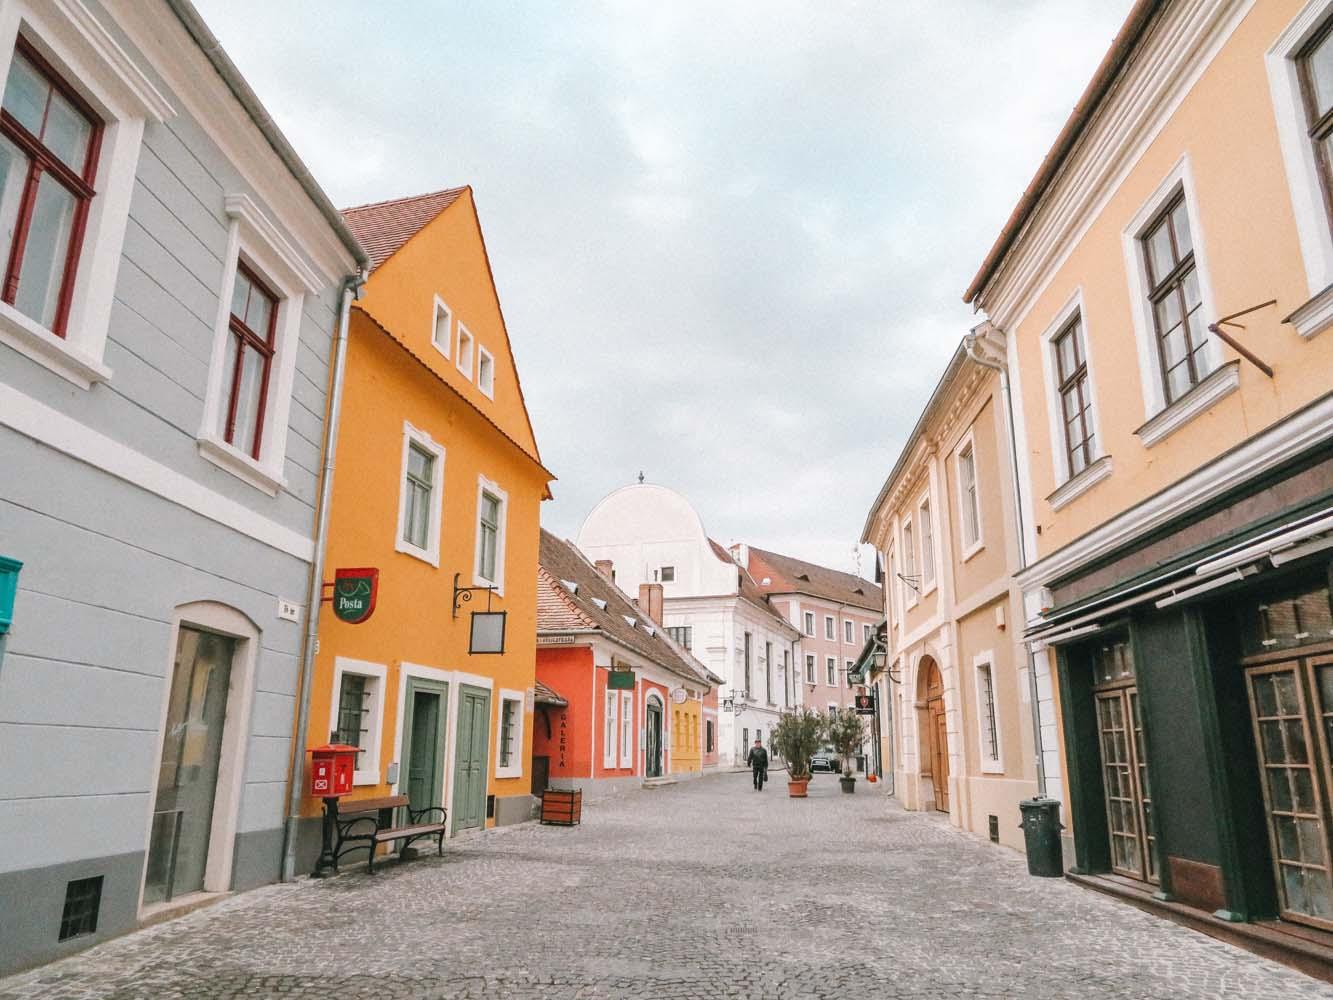 dagtrip vanuit Boedapest naar Szentendre - Map of Joy